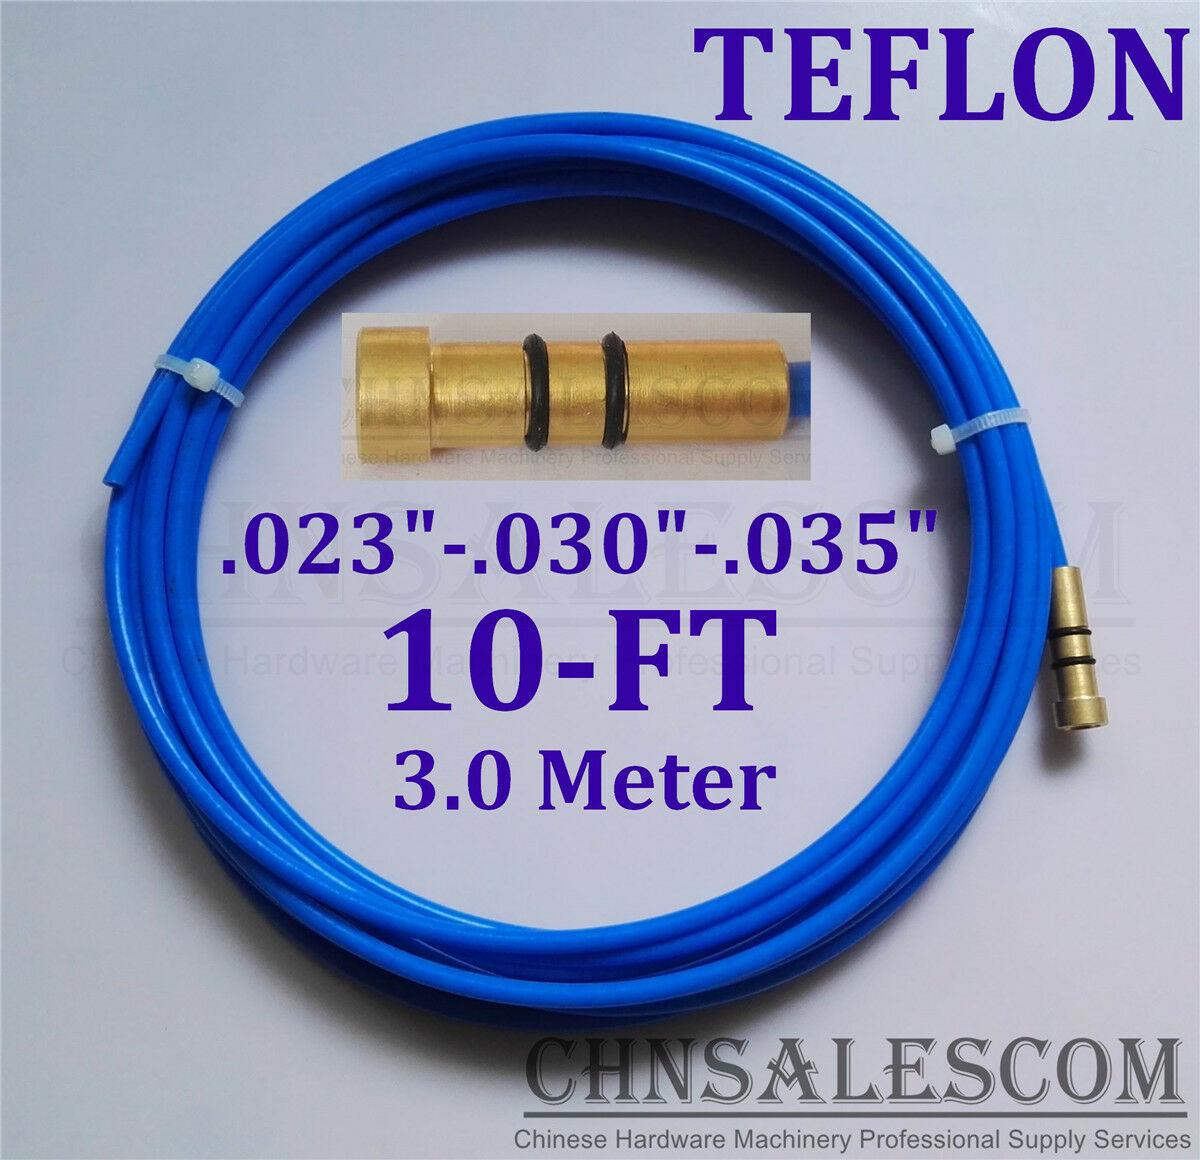 "CHNsalescom PTFE Liner 10-ft MIG Pistolas de soldadura tamaño del cable 0.023 ""-0.030""-0.035 ""Mi TW LI 3,0 M"